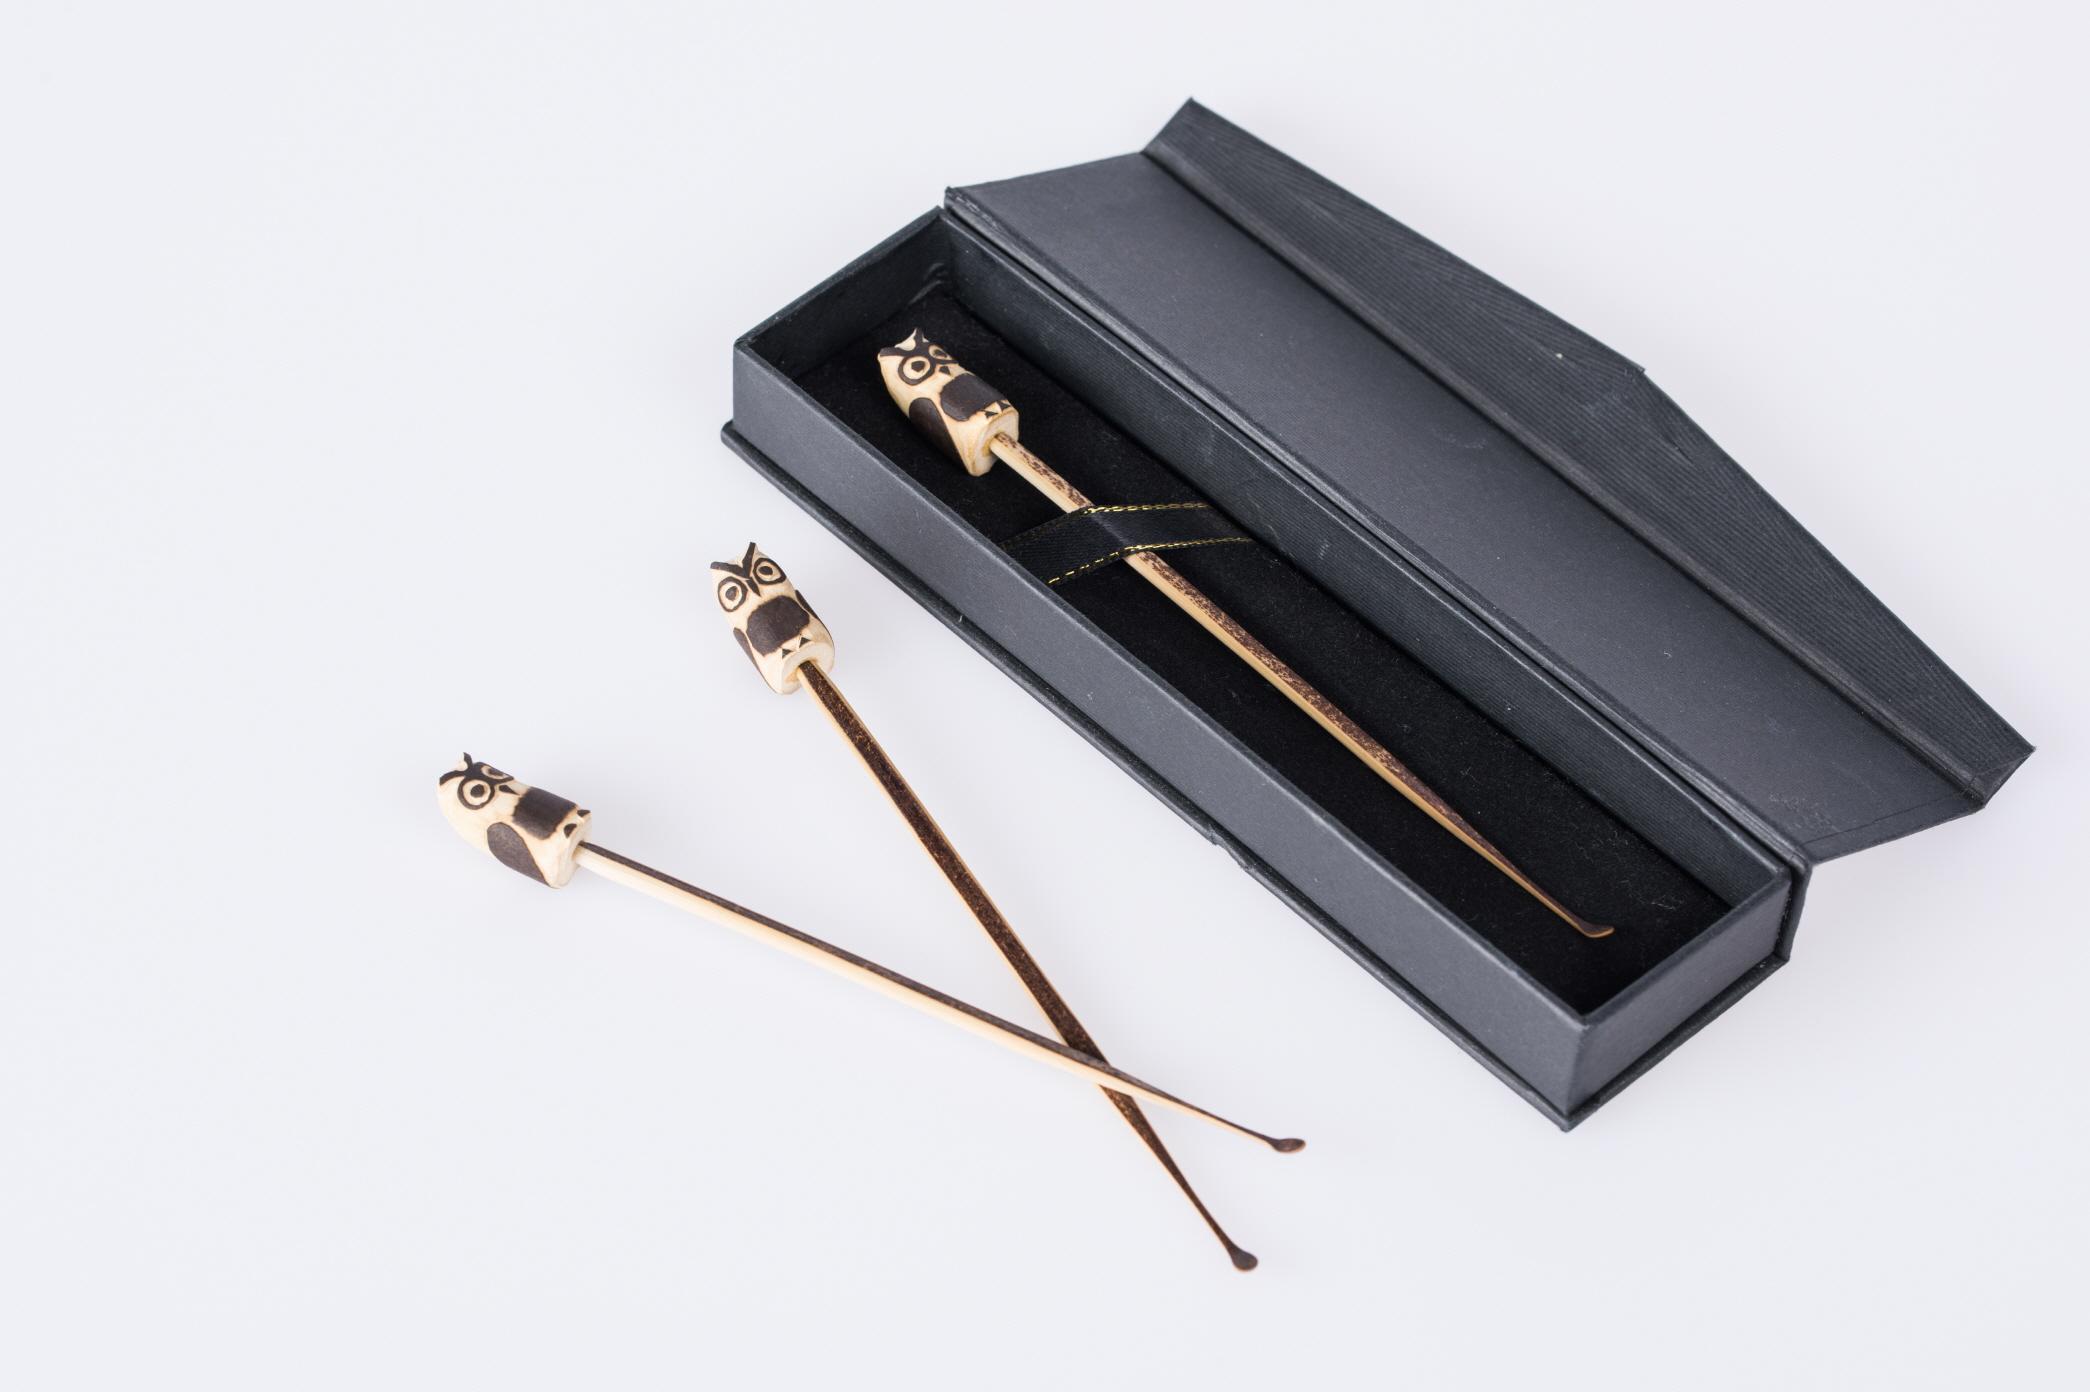 Hairpin-shaped Black Bamboo Ballpoint Pen